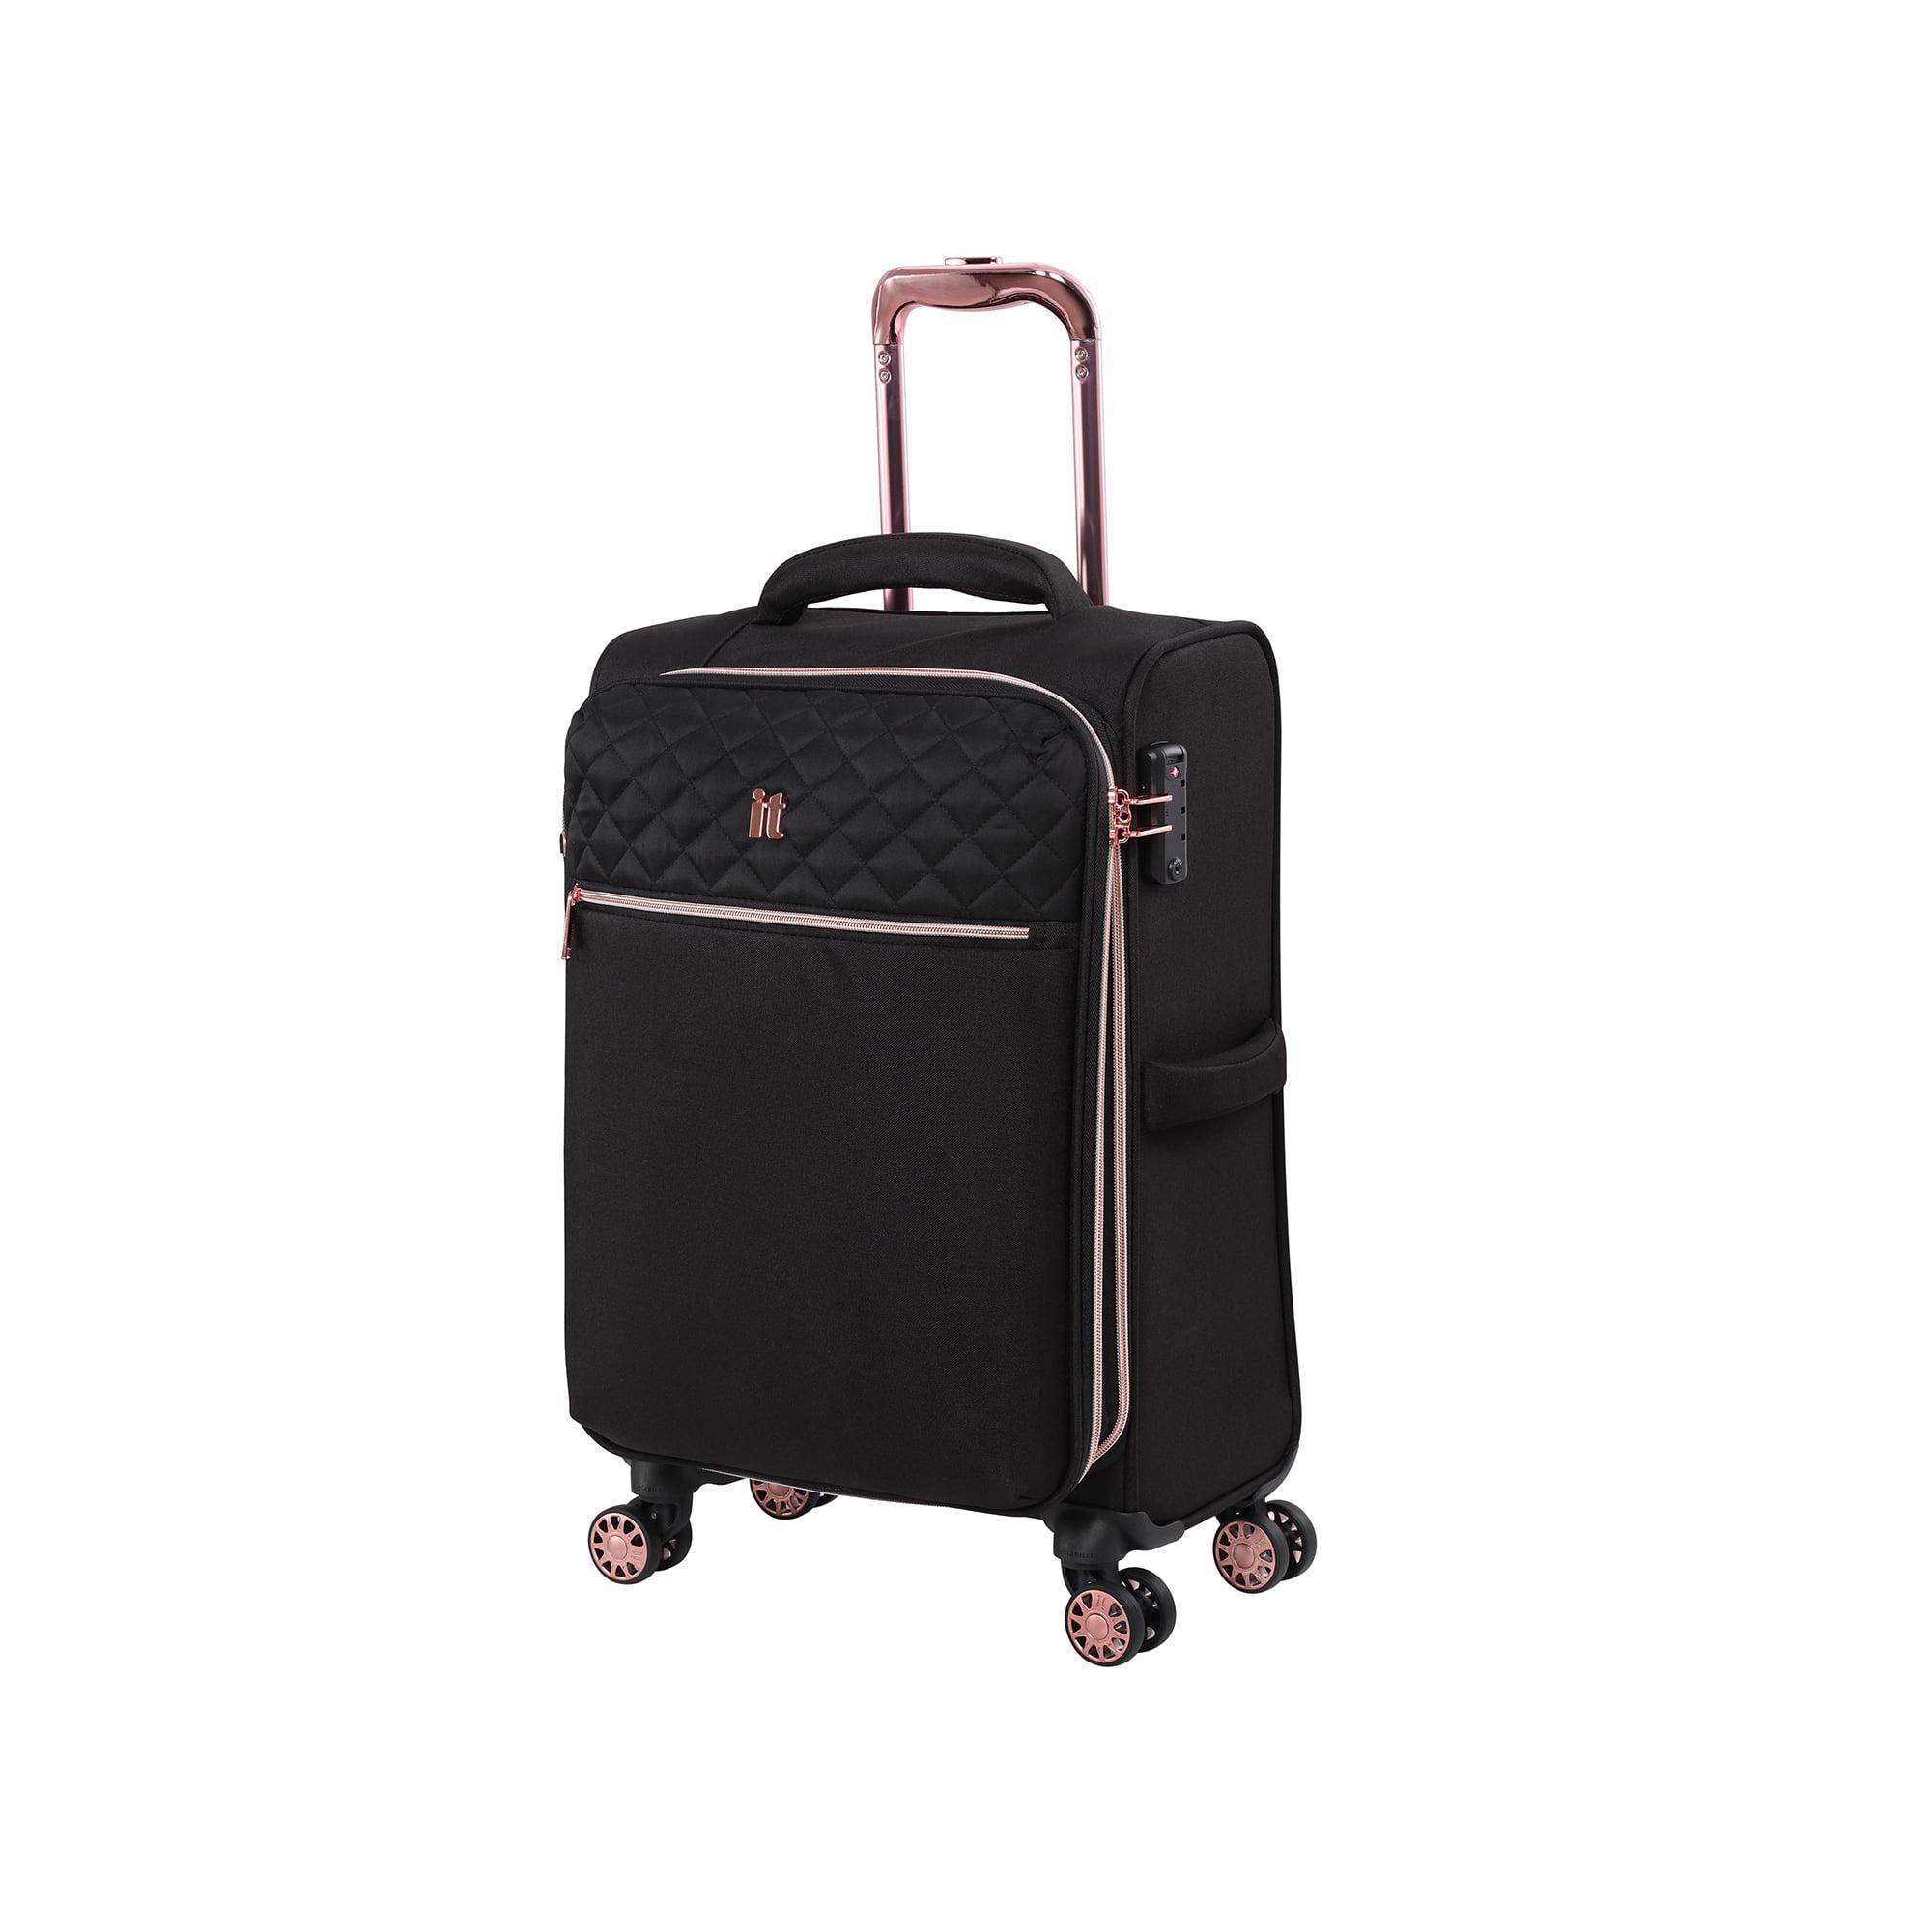 70 cm it luggage Divinity 8 Wheel Lightweight Semi Expander Suitcase Medium with TSA Lock Valise